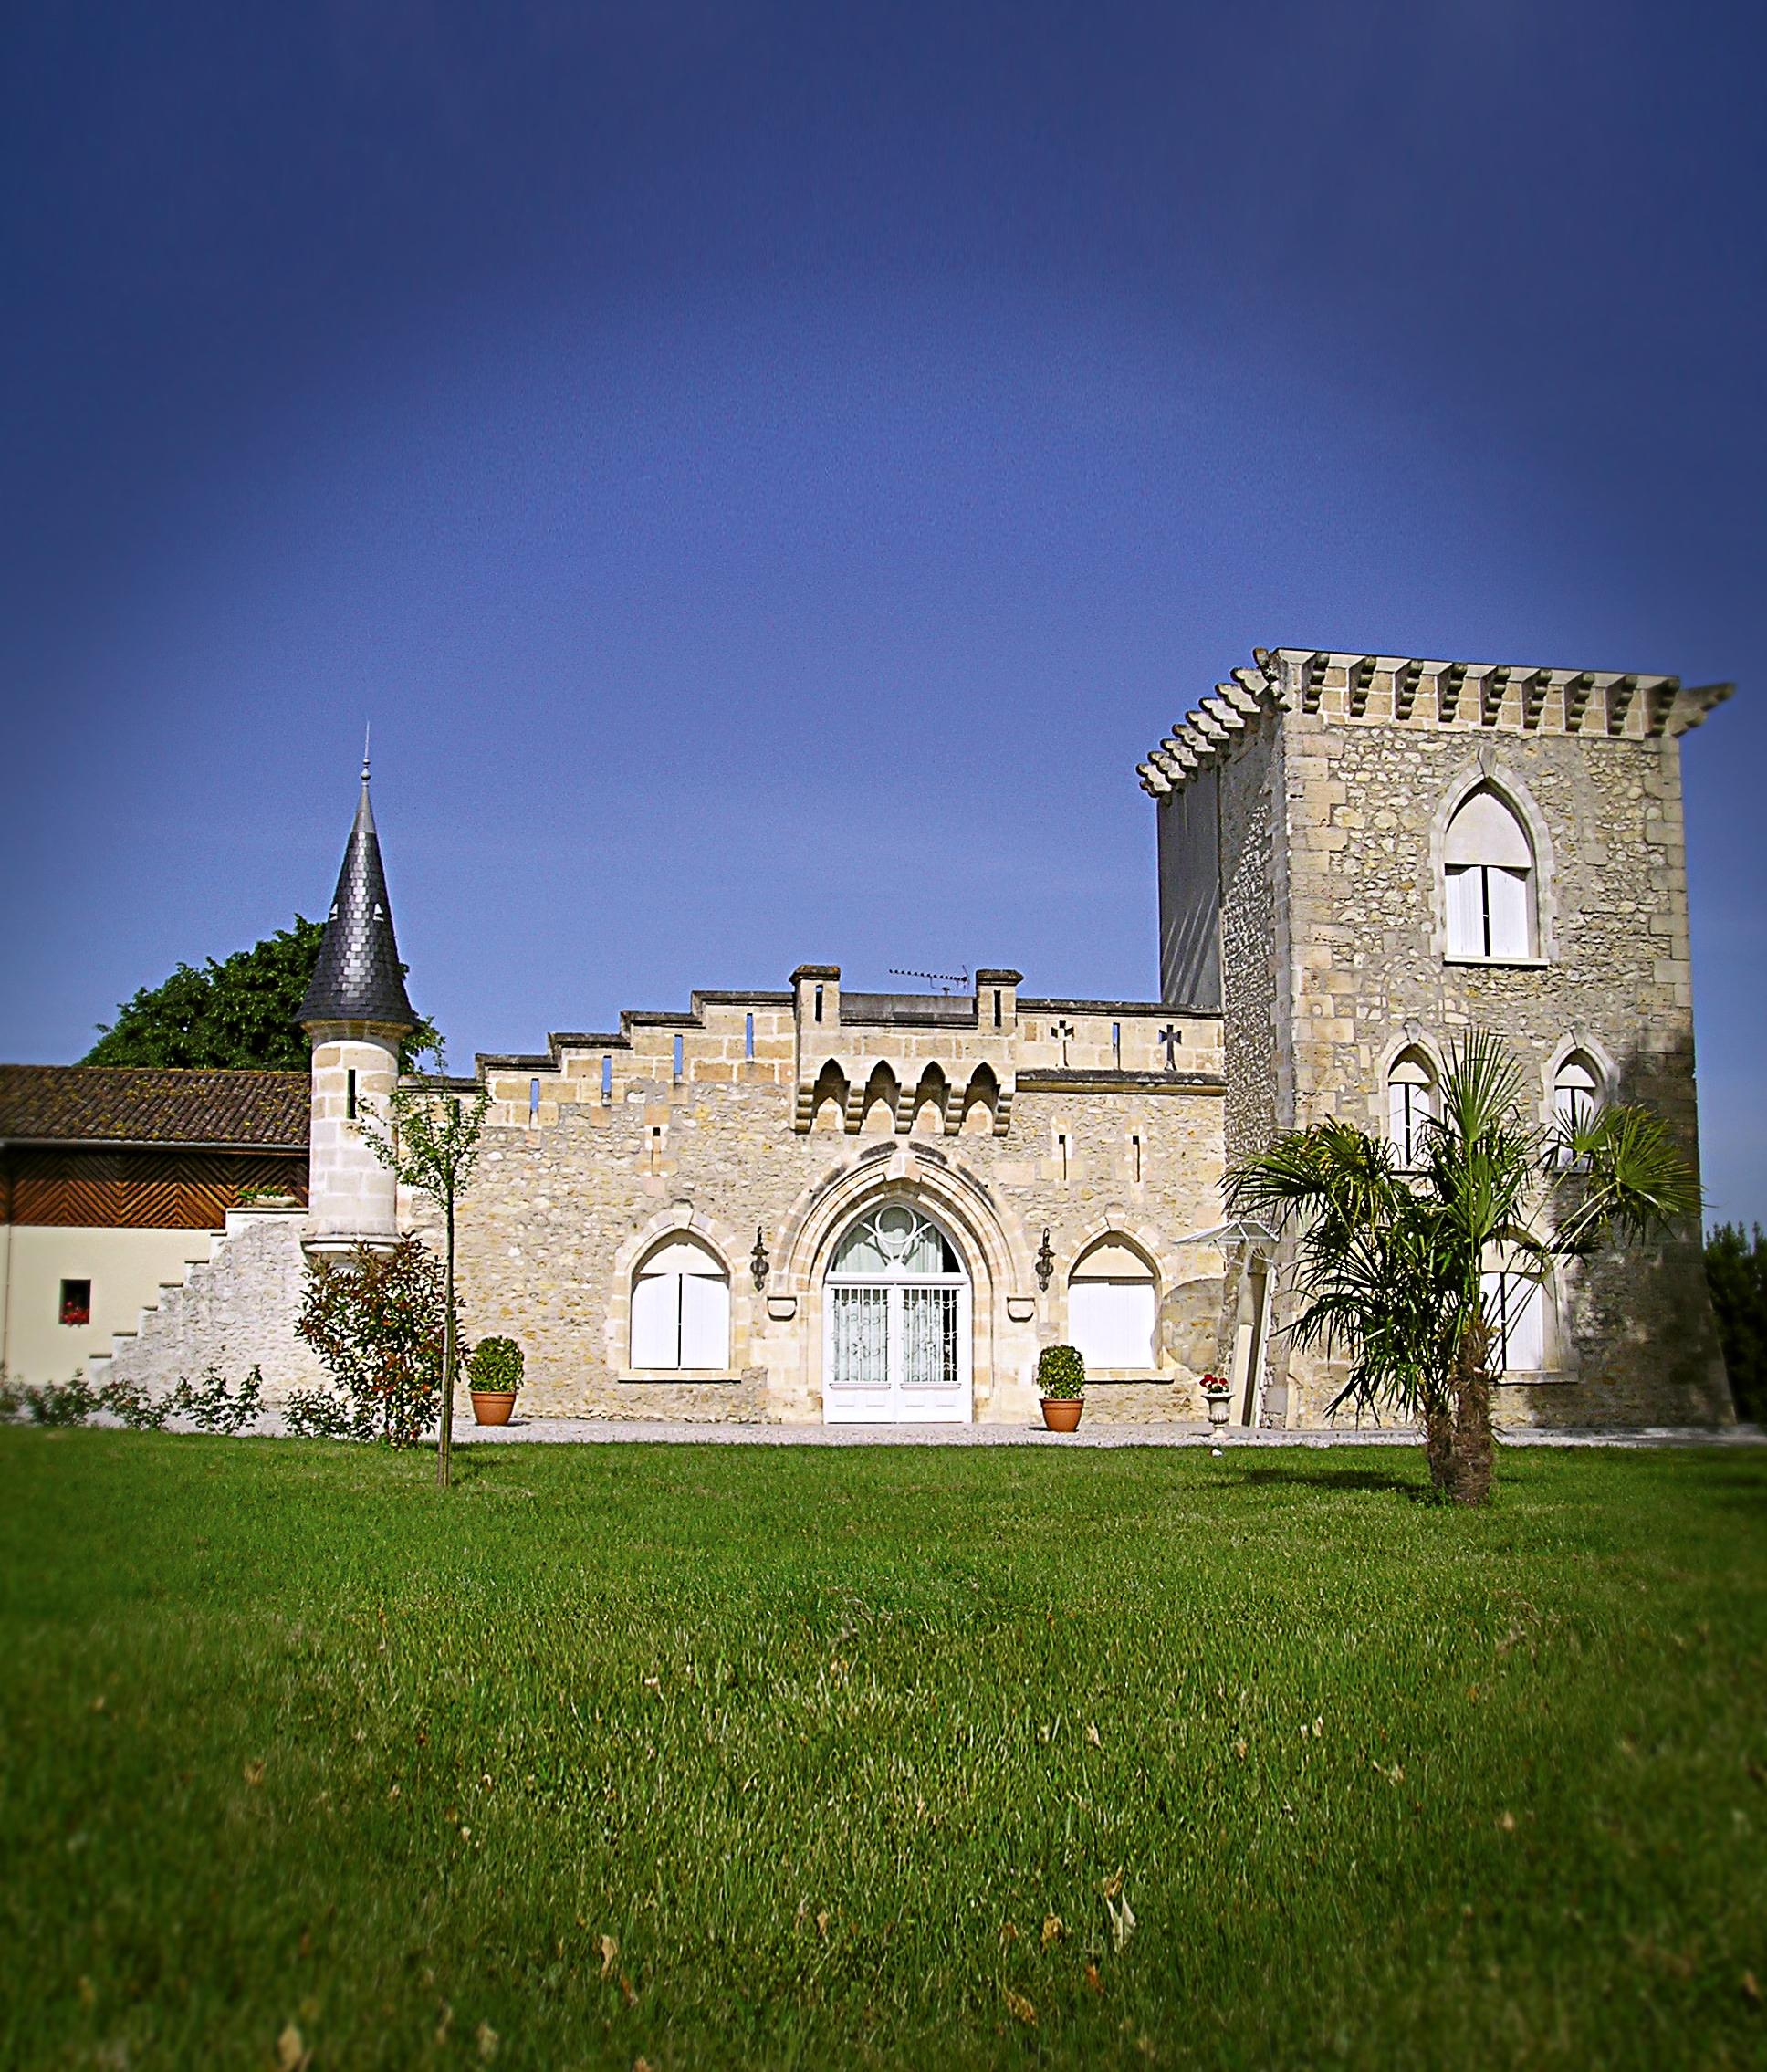 Chateau Tour Sieujean – Pierre Noble